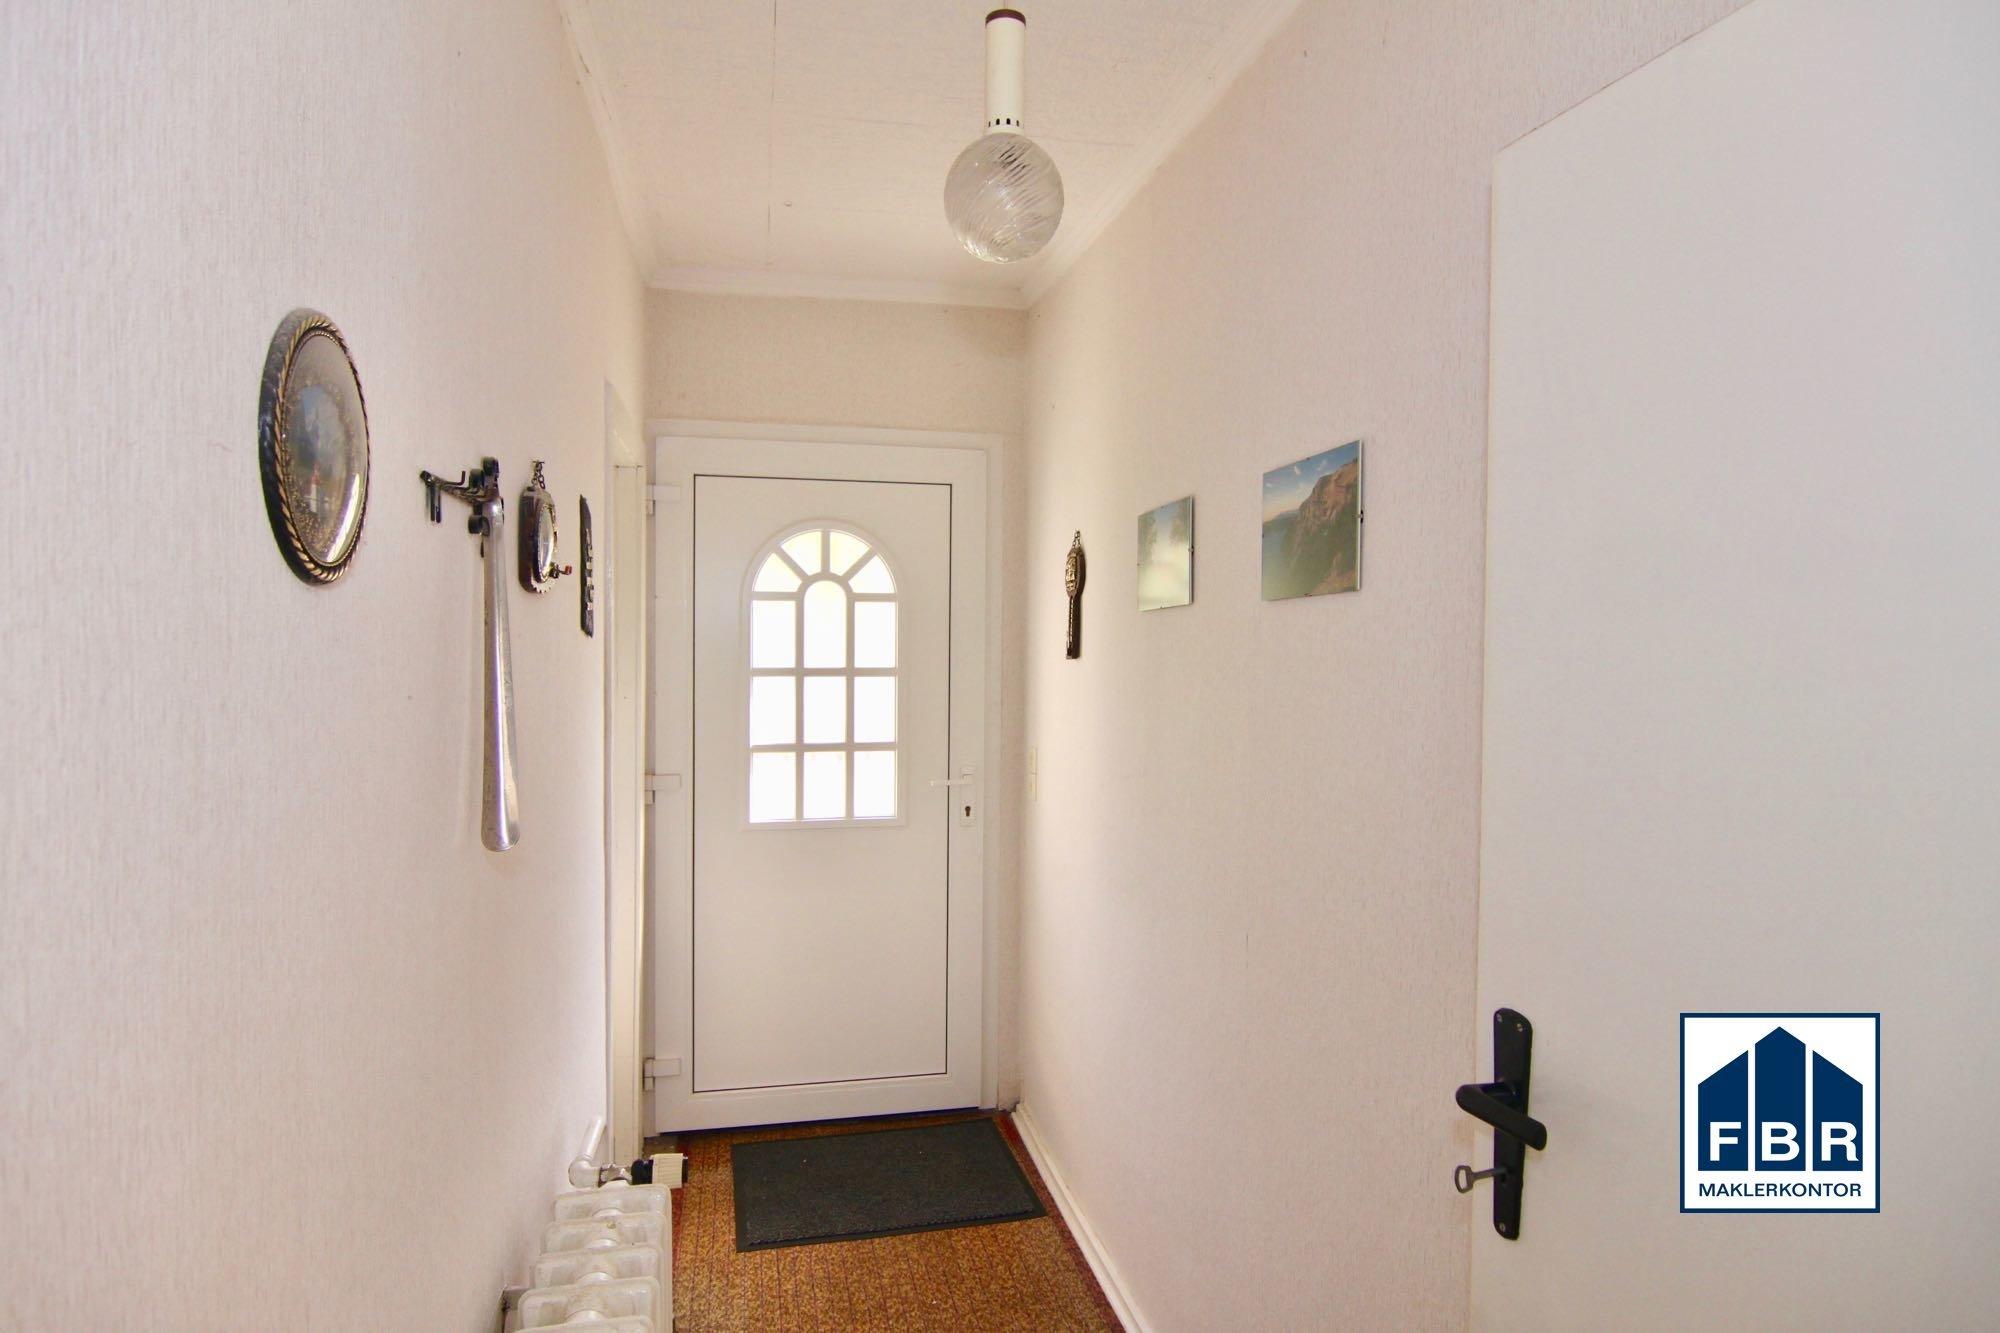 Haustür + Flurbereicheingangs